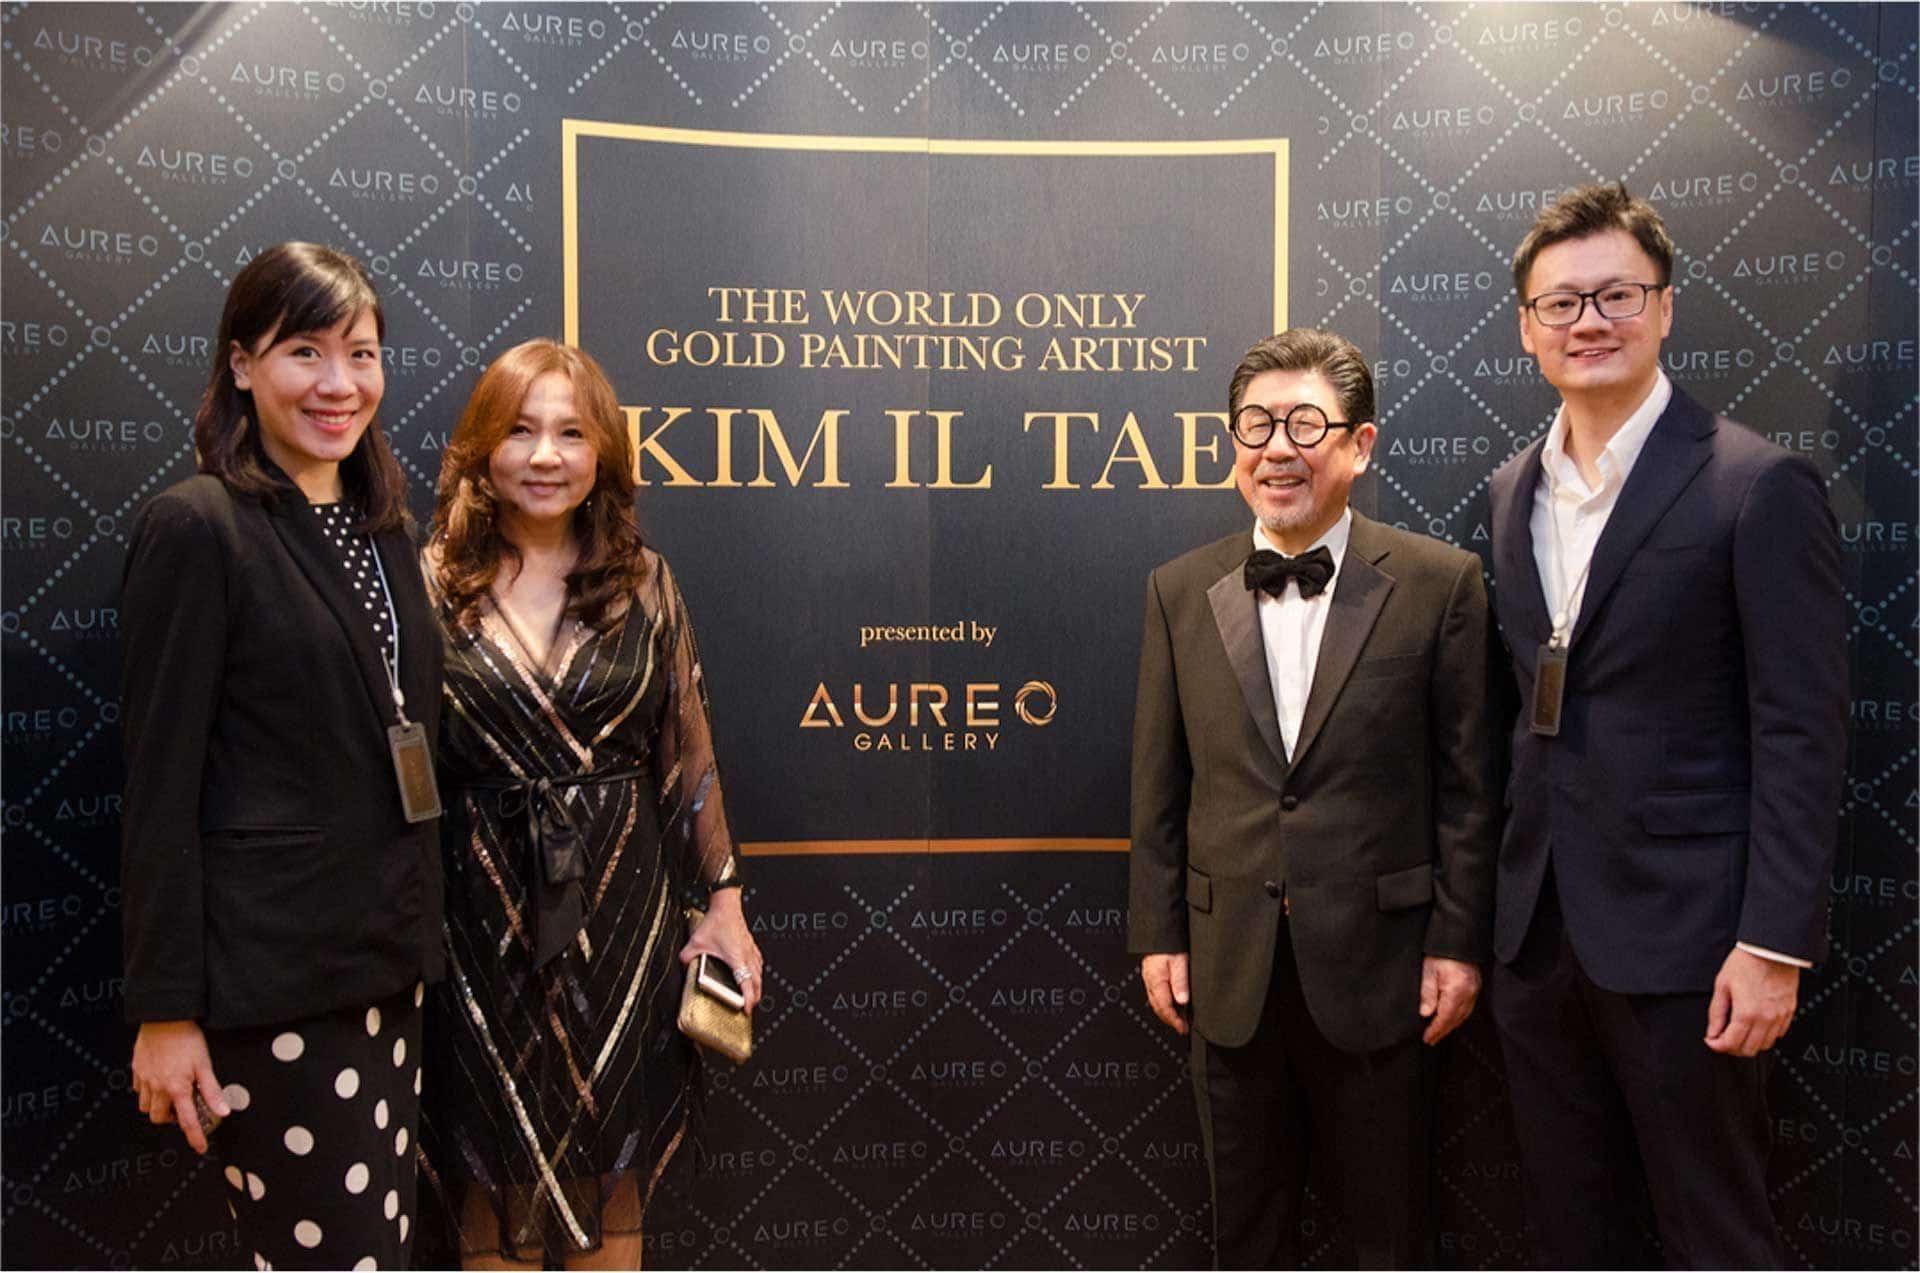 The Aureo team and Kim Il Tae